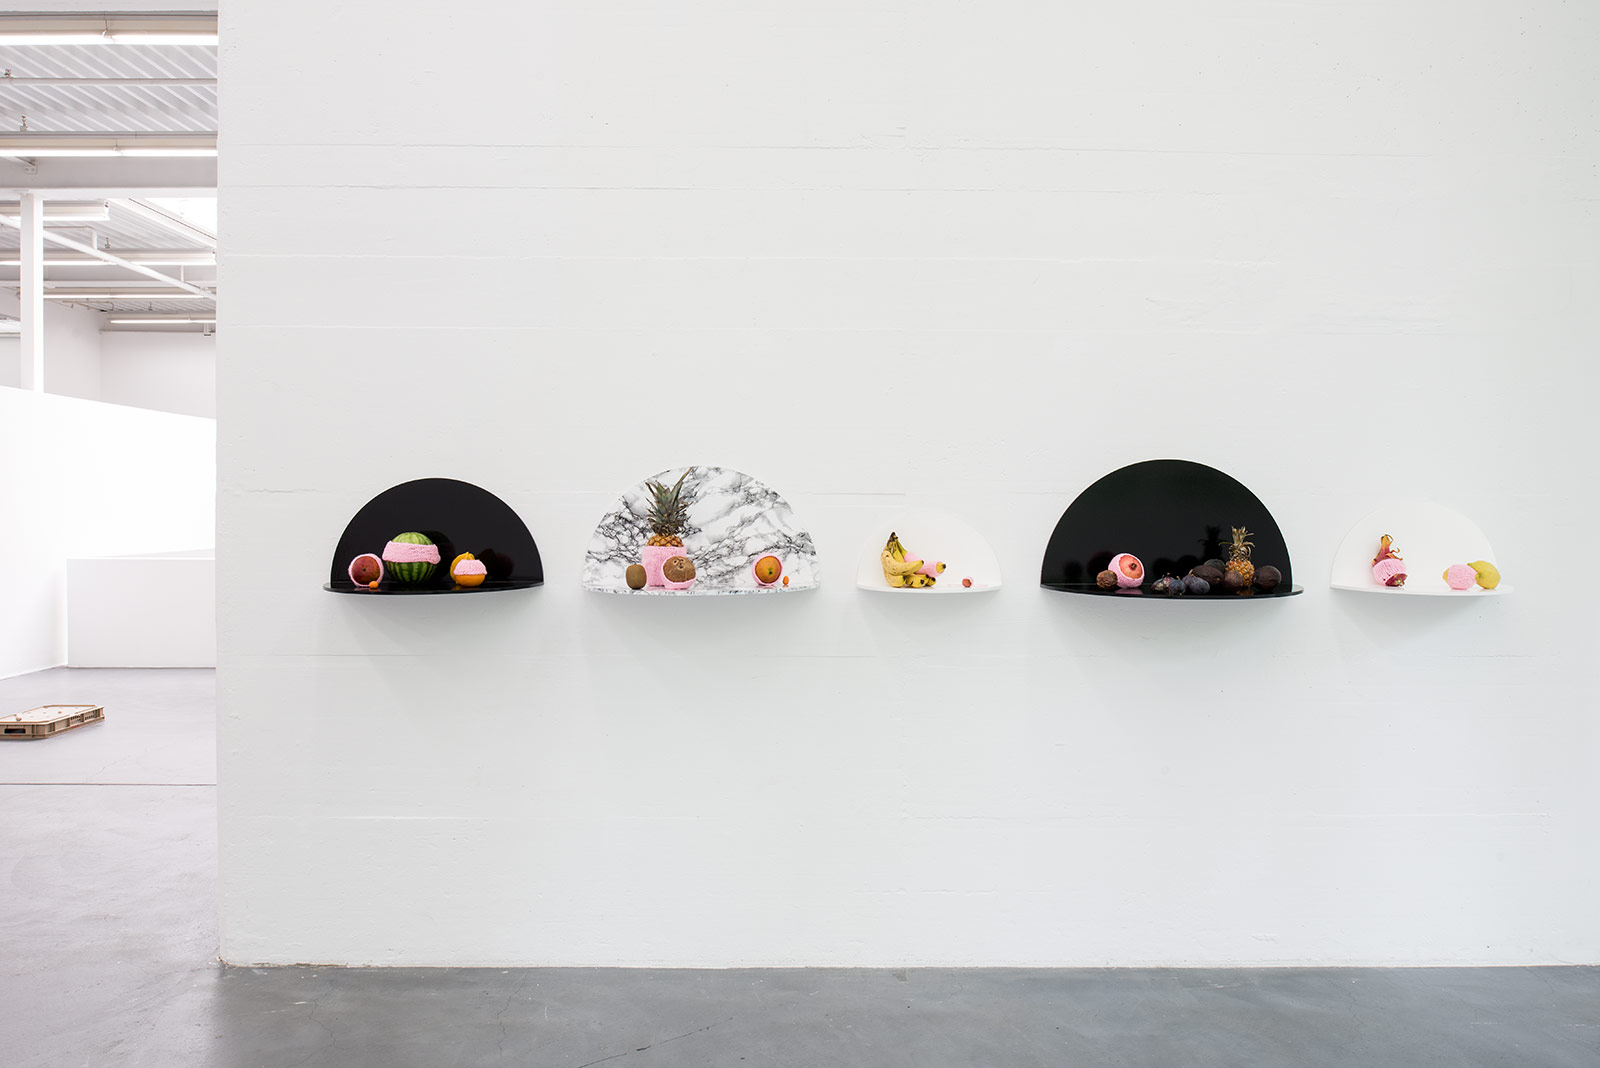 Aline Stalder – Institut Kunst, Diplom 2017